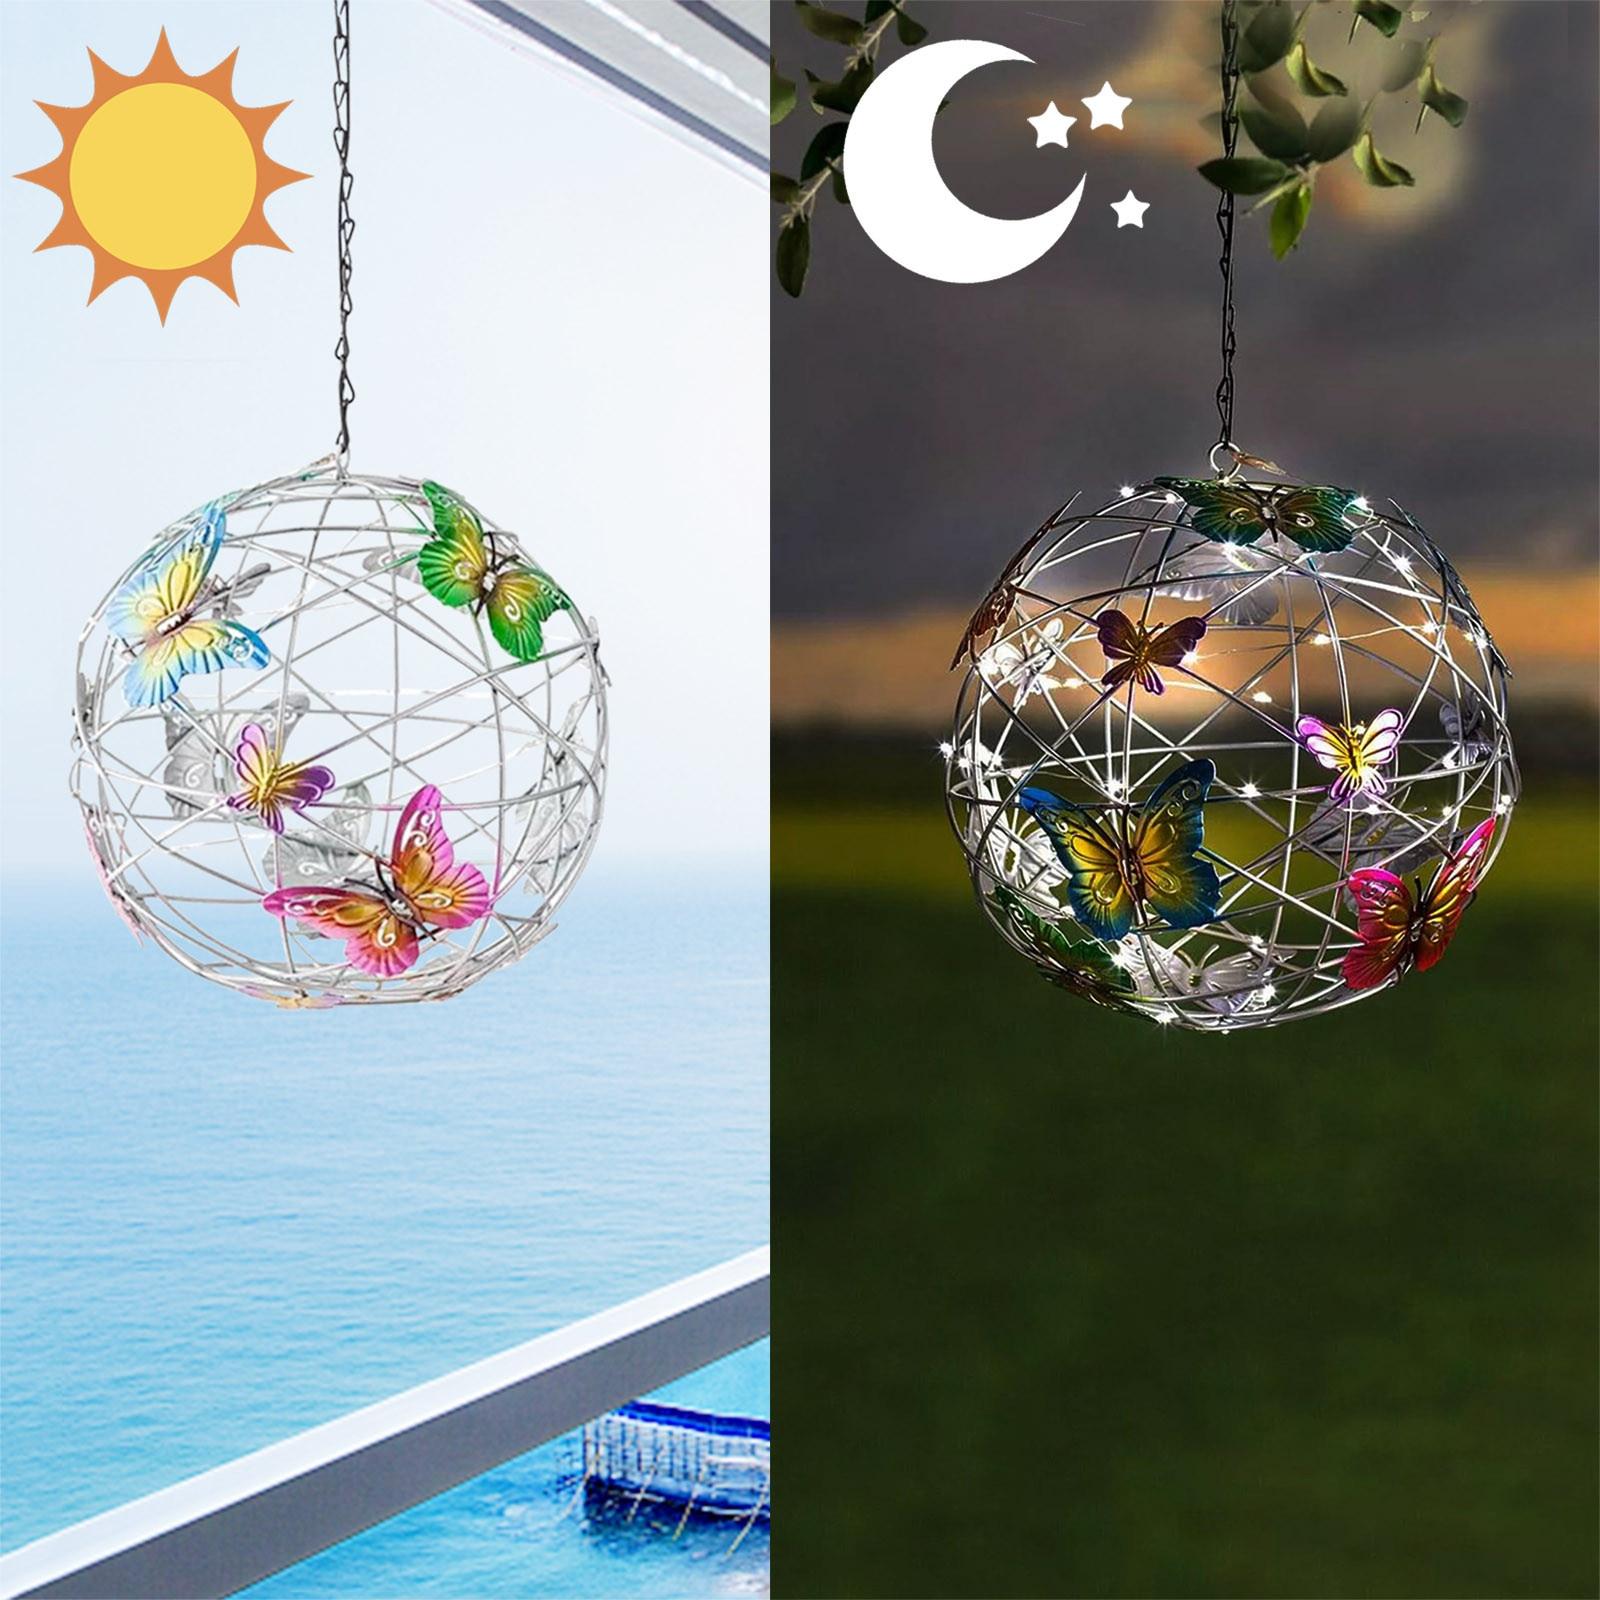 Orb de malla colgante con luz Solar, bola de cristal con mariposas...